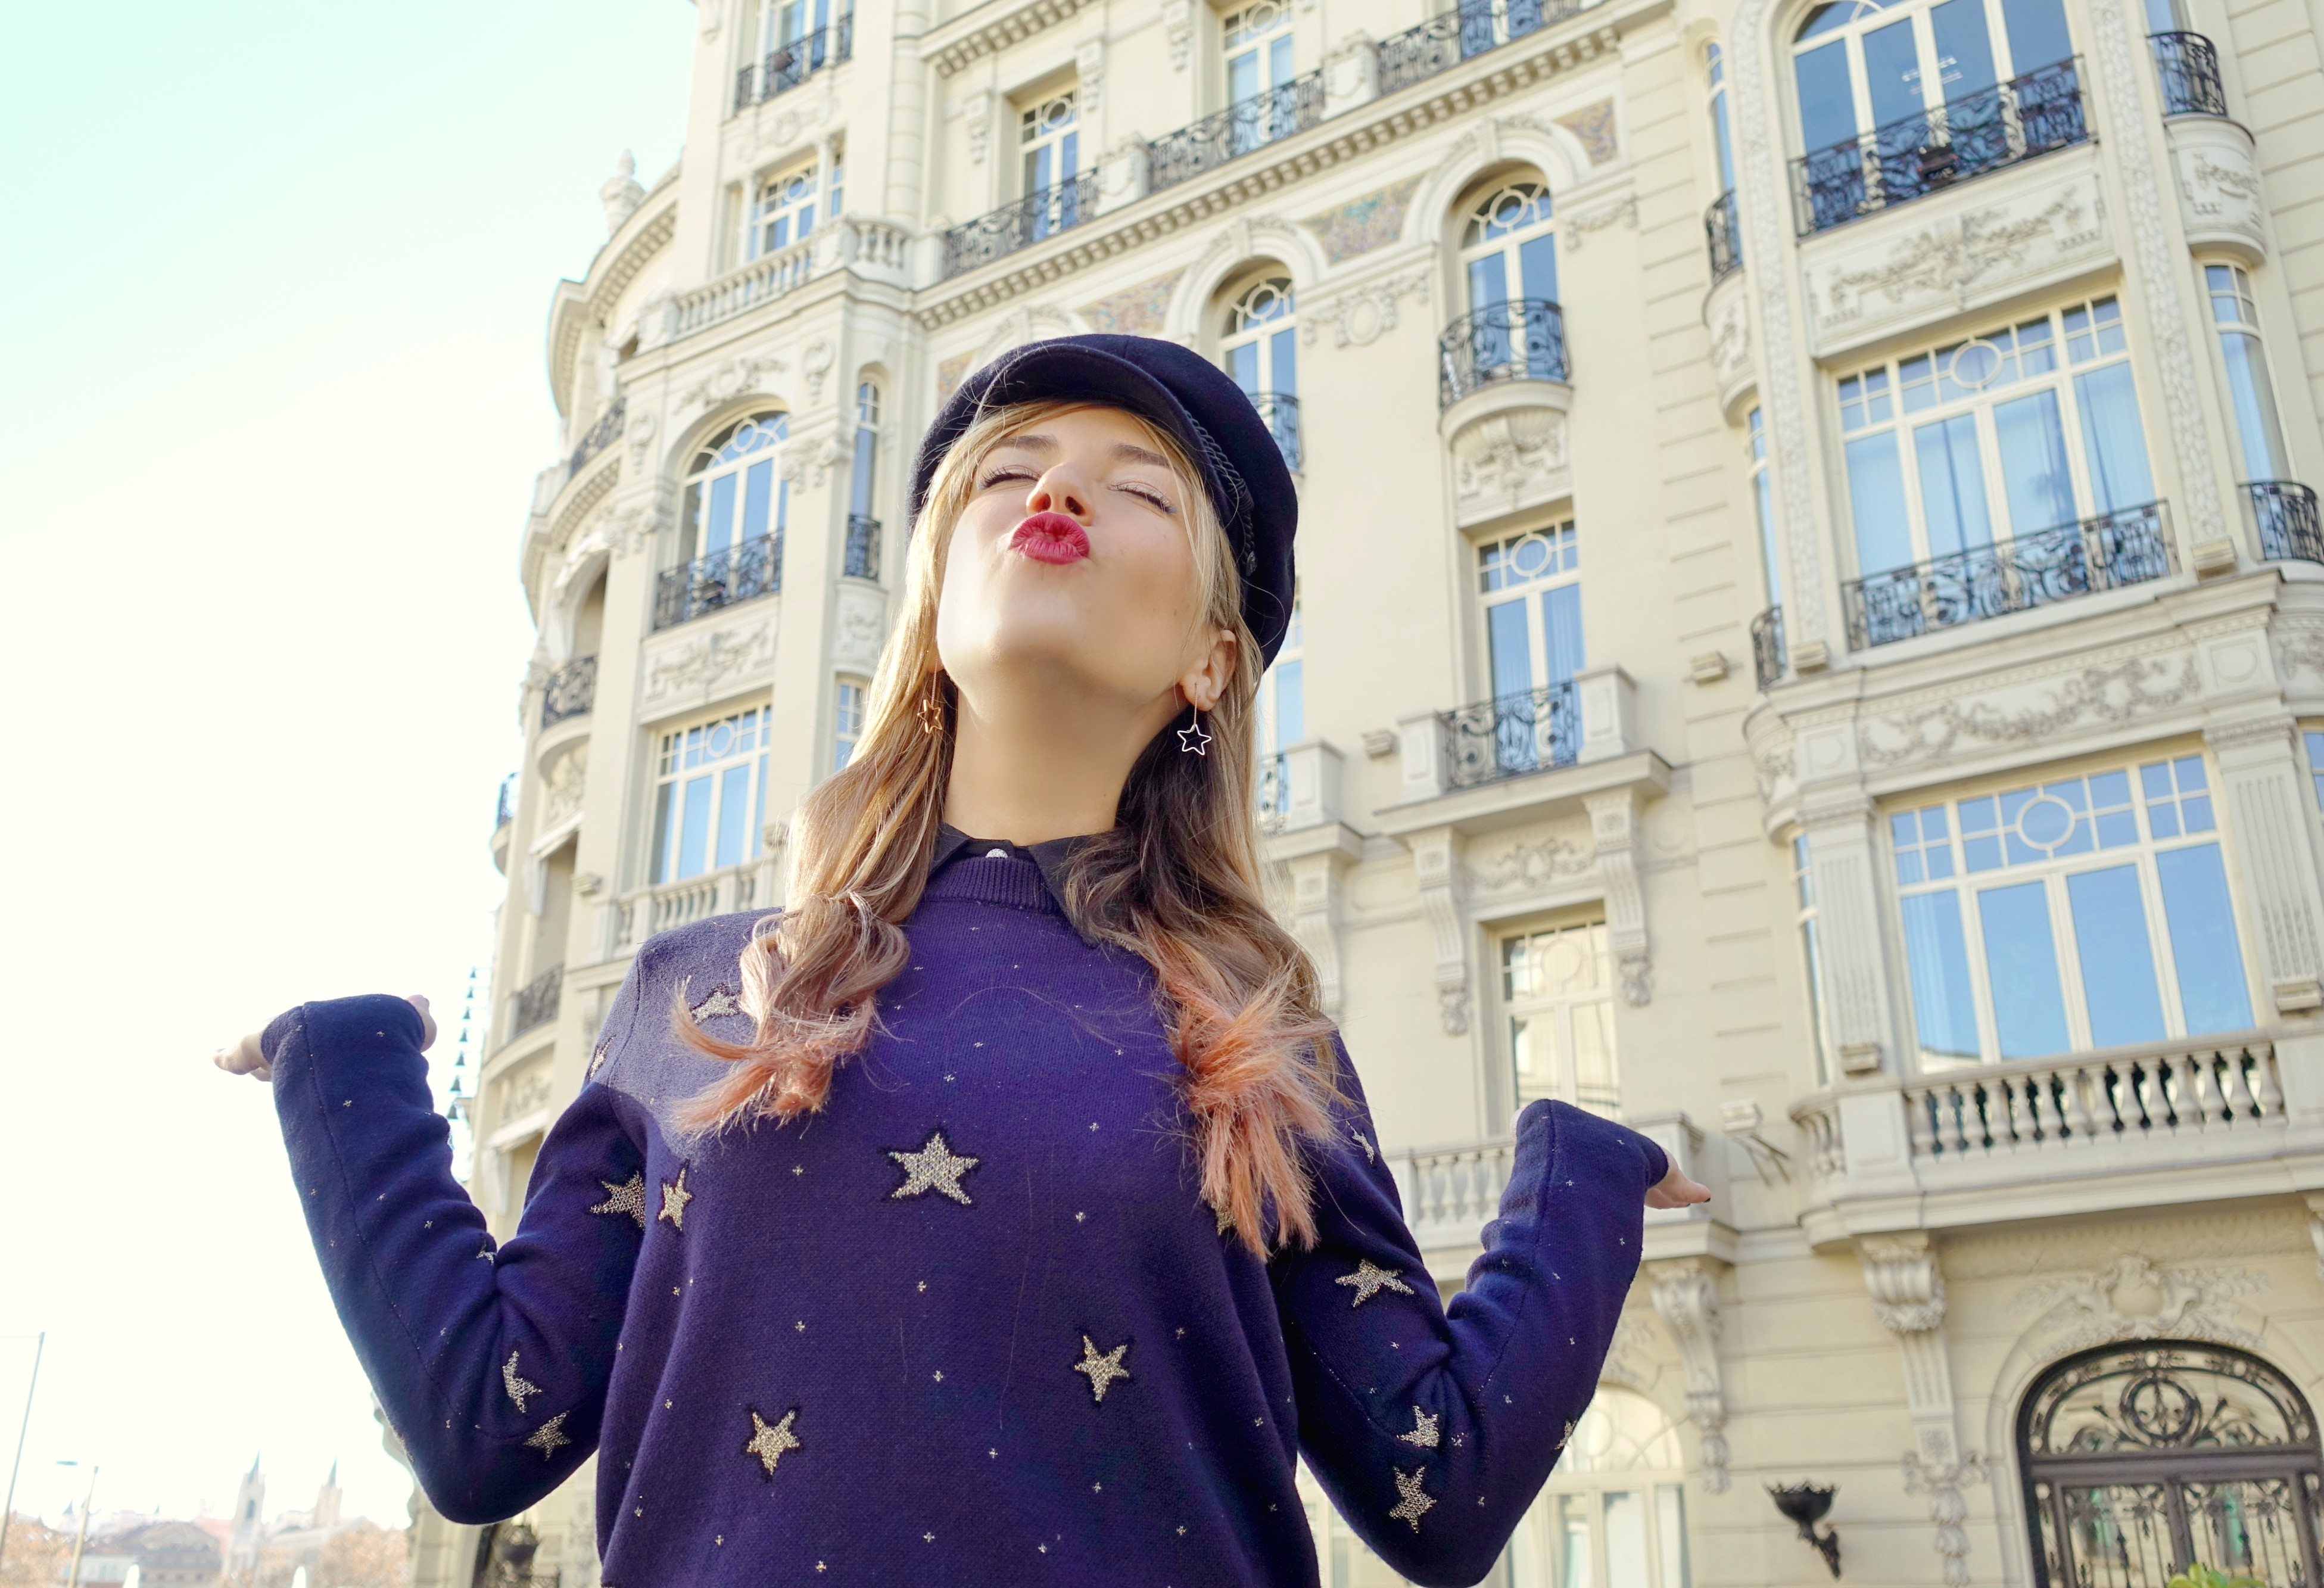 Jersey-de-estrellas-blog-de-moda-ChicAdicta-influencer-Chic-Adicta-Amichi-style-blue-outfit-Madrid-street-style-PiensaenChic-Piensa-en-Chic